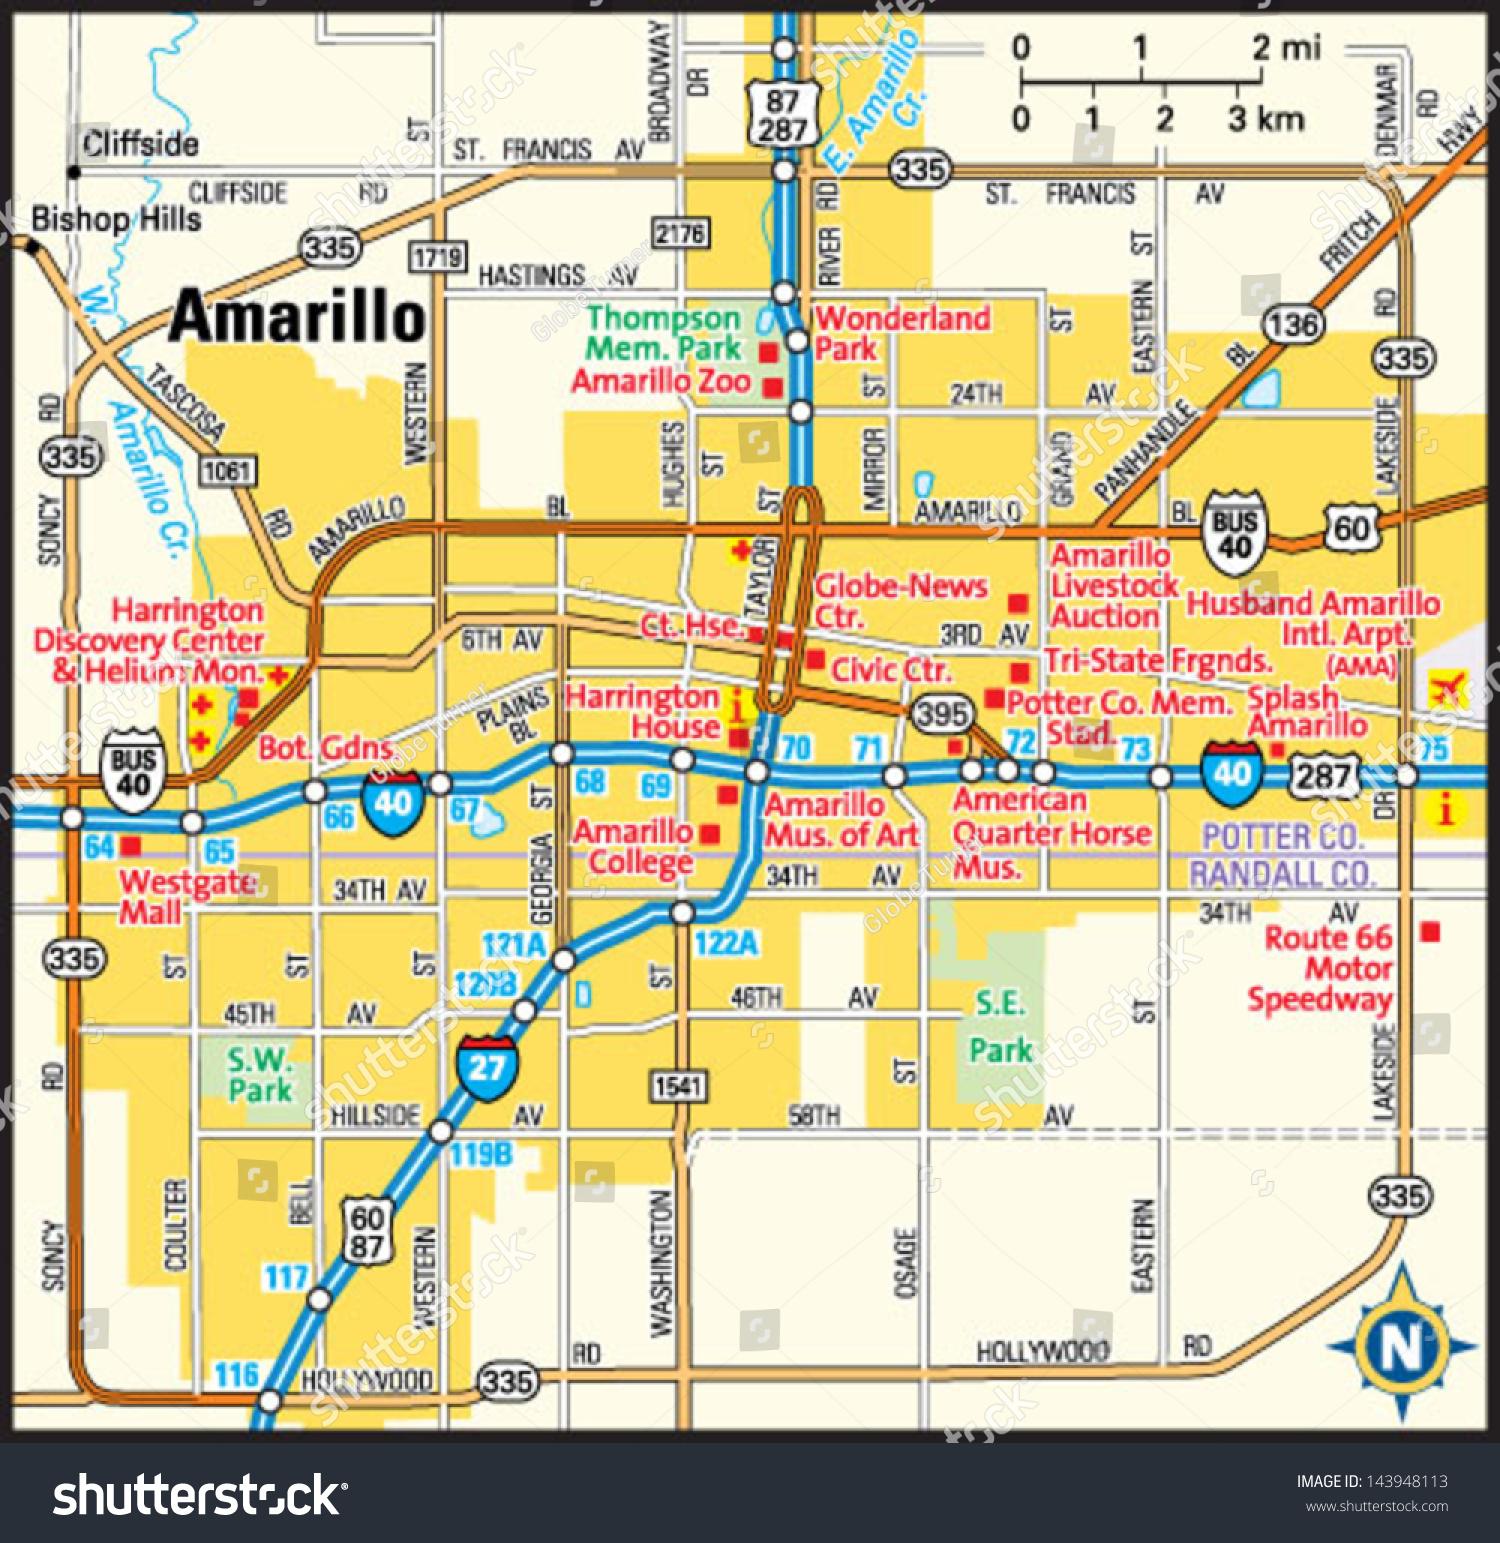 Map Of Amarillo Texas | Business Ideas 2013 - Printable Map Of Amarillo Tx